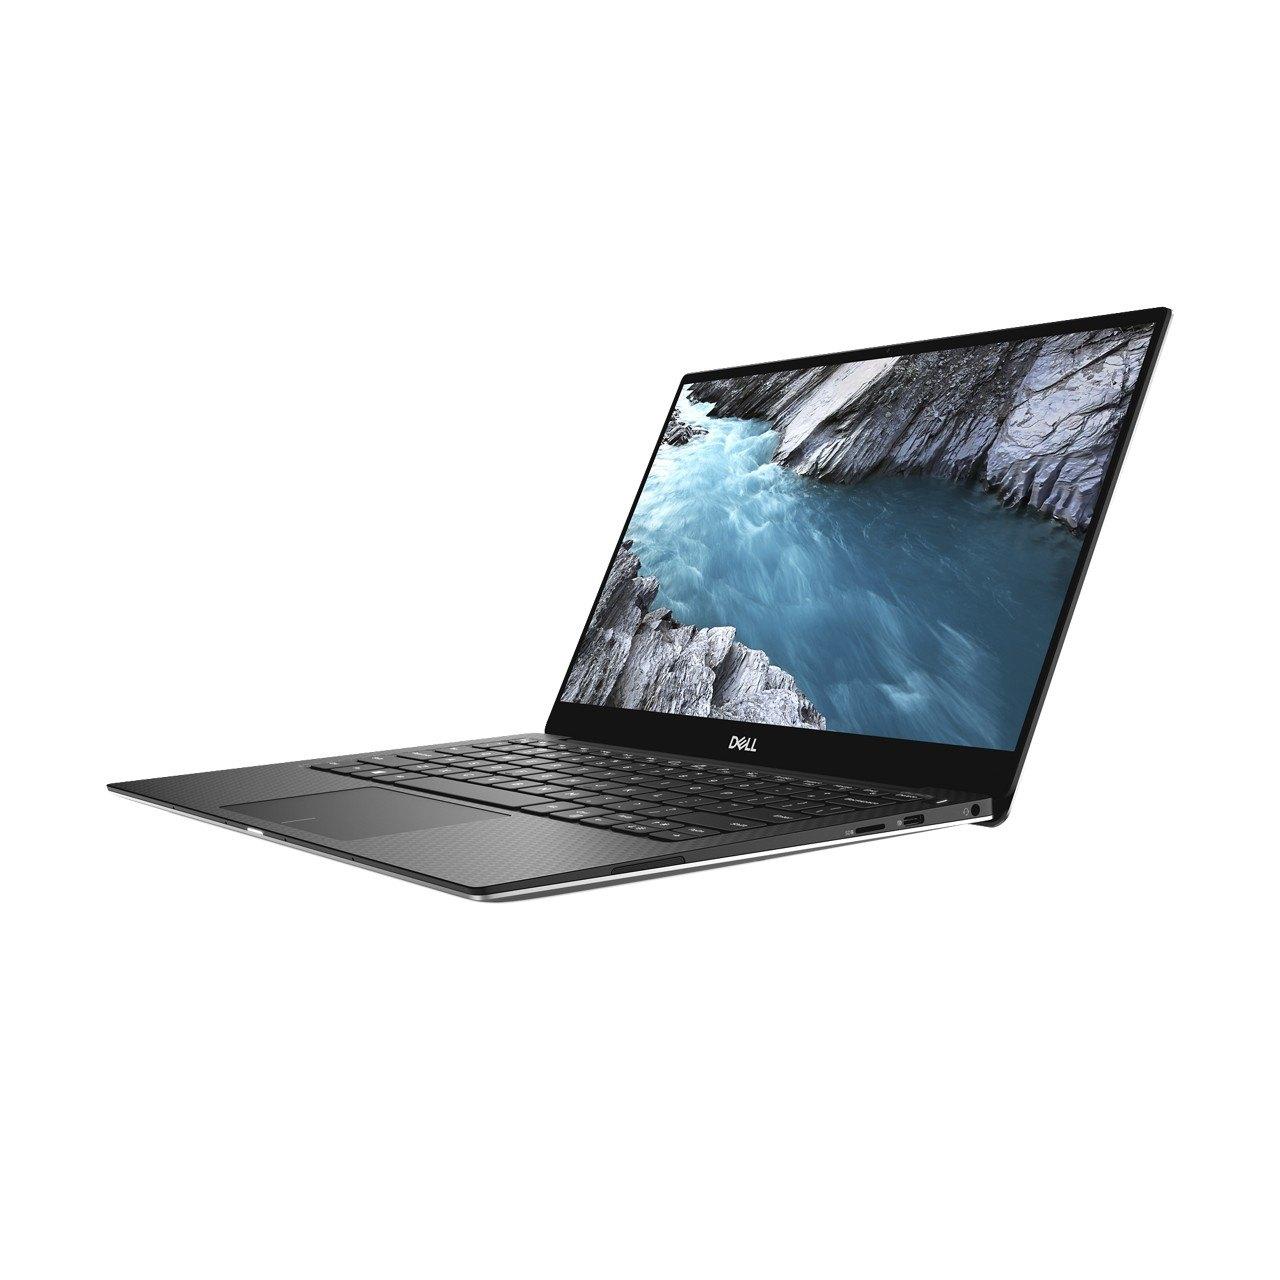 Dell XPS 13 Laptop 9380 - 4K Touch -i7-8565U- 512GB SSD- 16GB RAM :  $1,597.99 +  $559.30 back in points + FS $1597.99